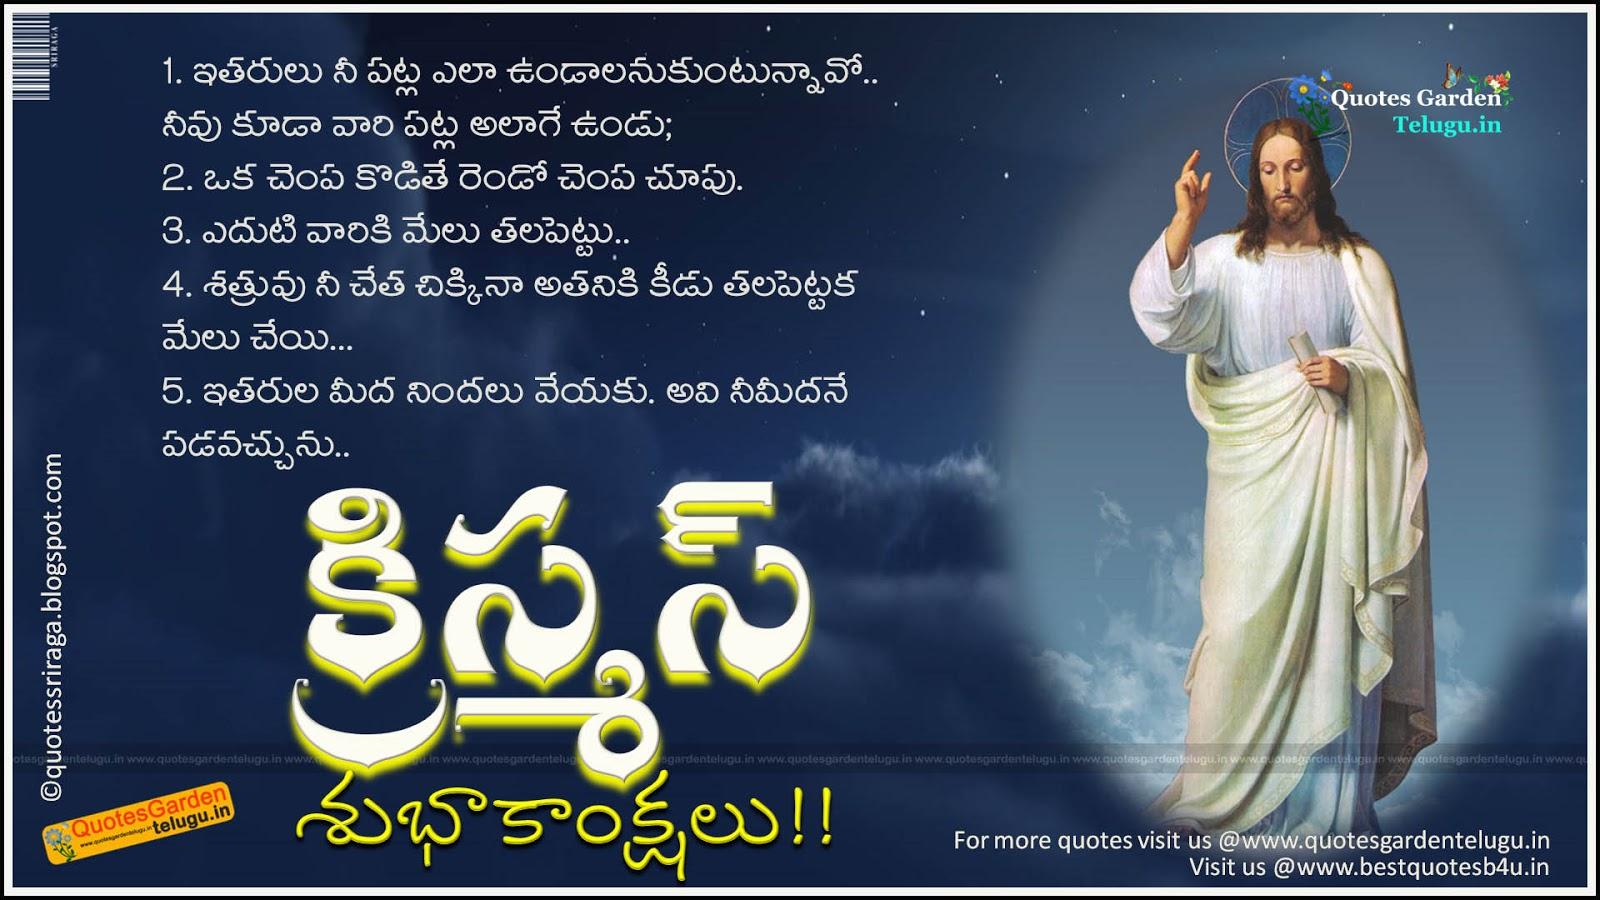 Christmas Telugu Greetings Christ pravachanalu